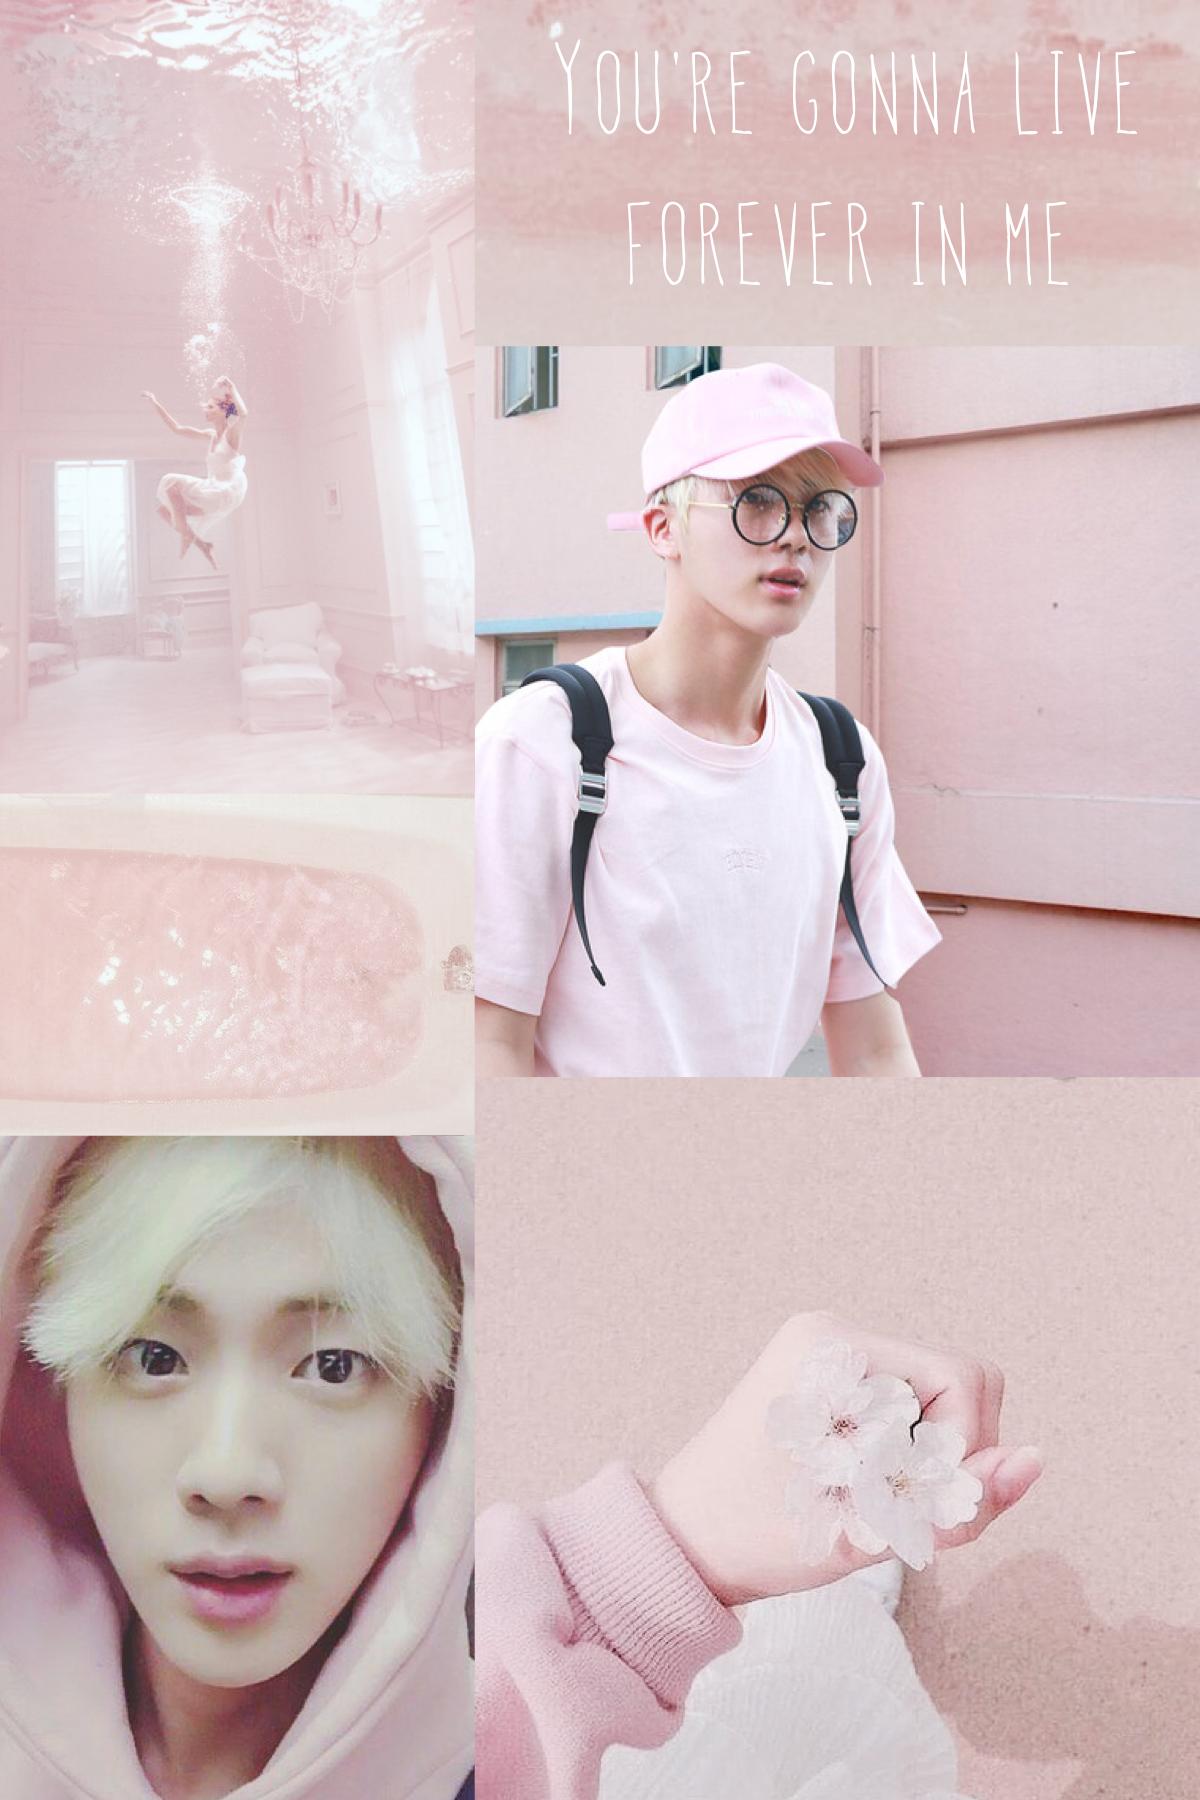 Jin Kim Seokjin Pink Aesthetic Pink Aesthetic Kim Seokjin Bts Jin